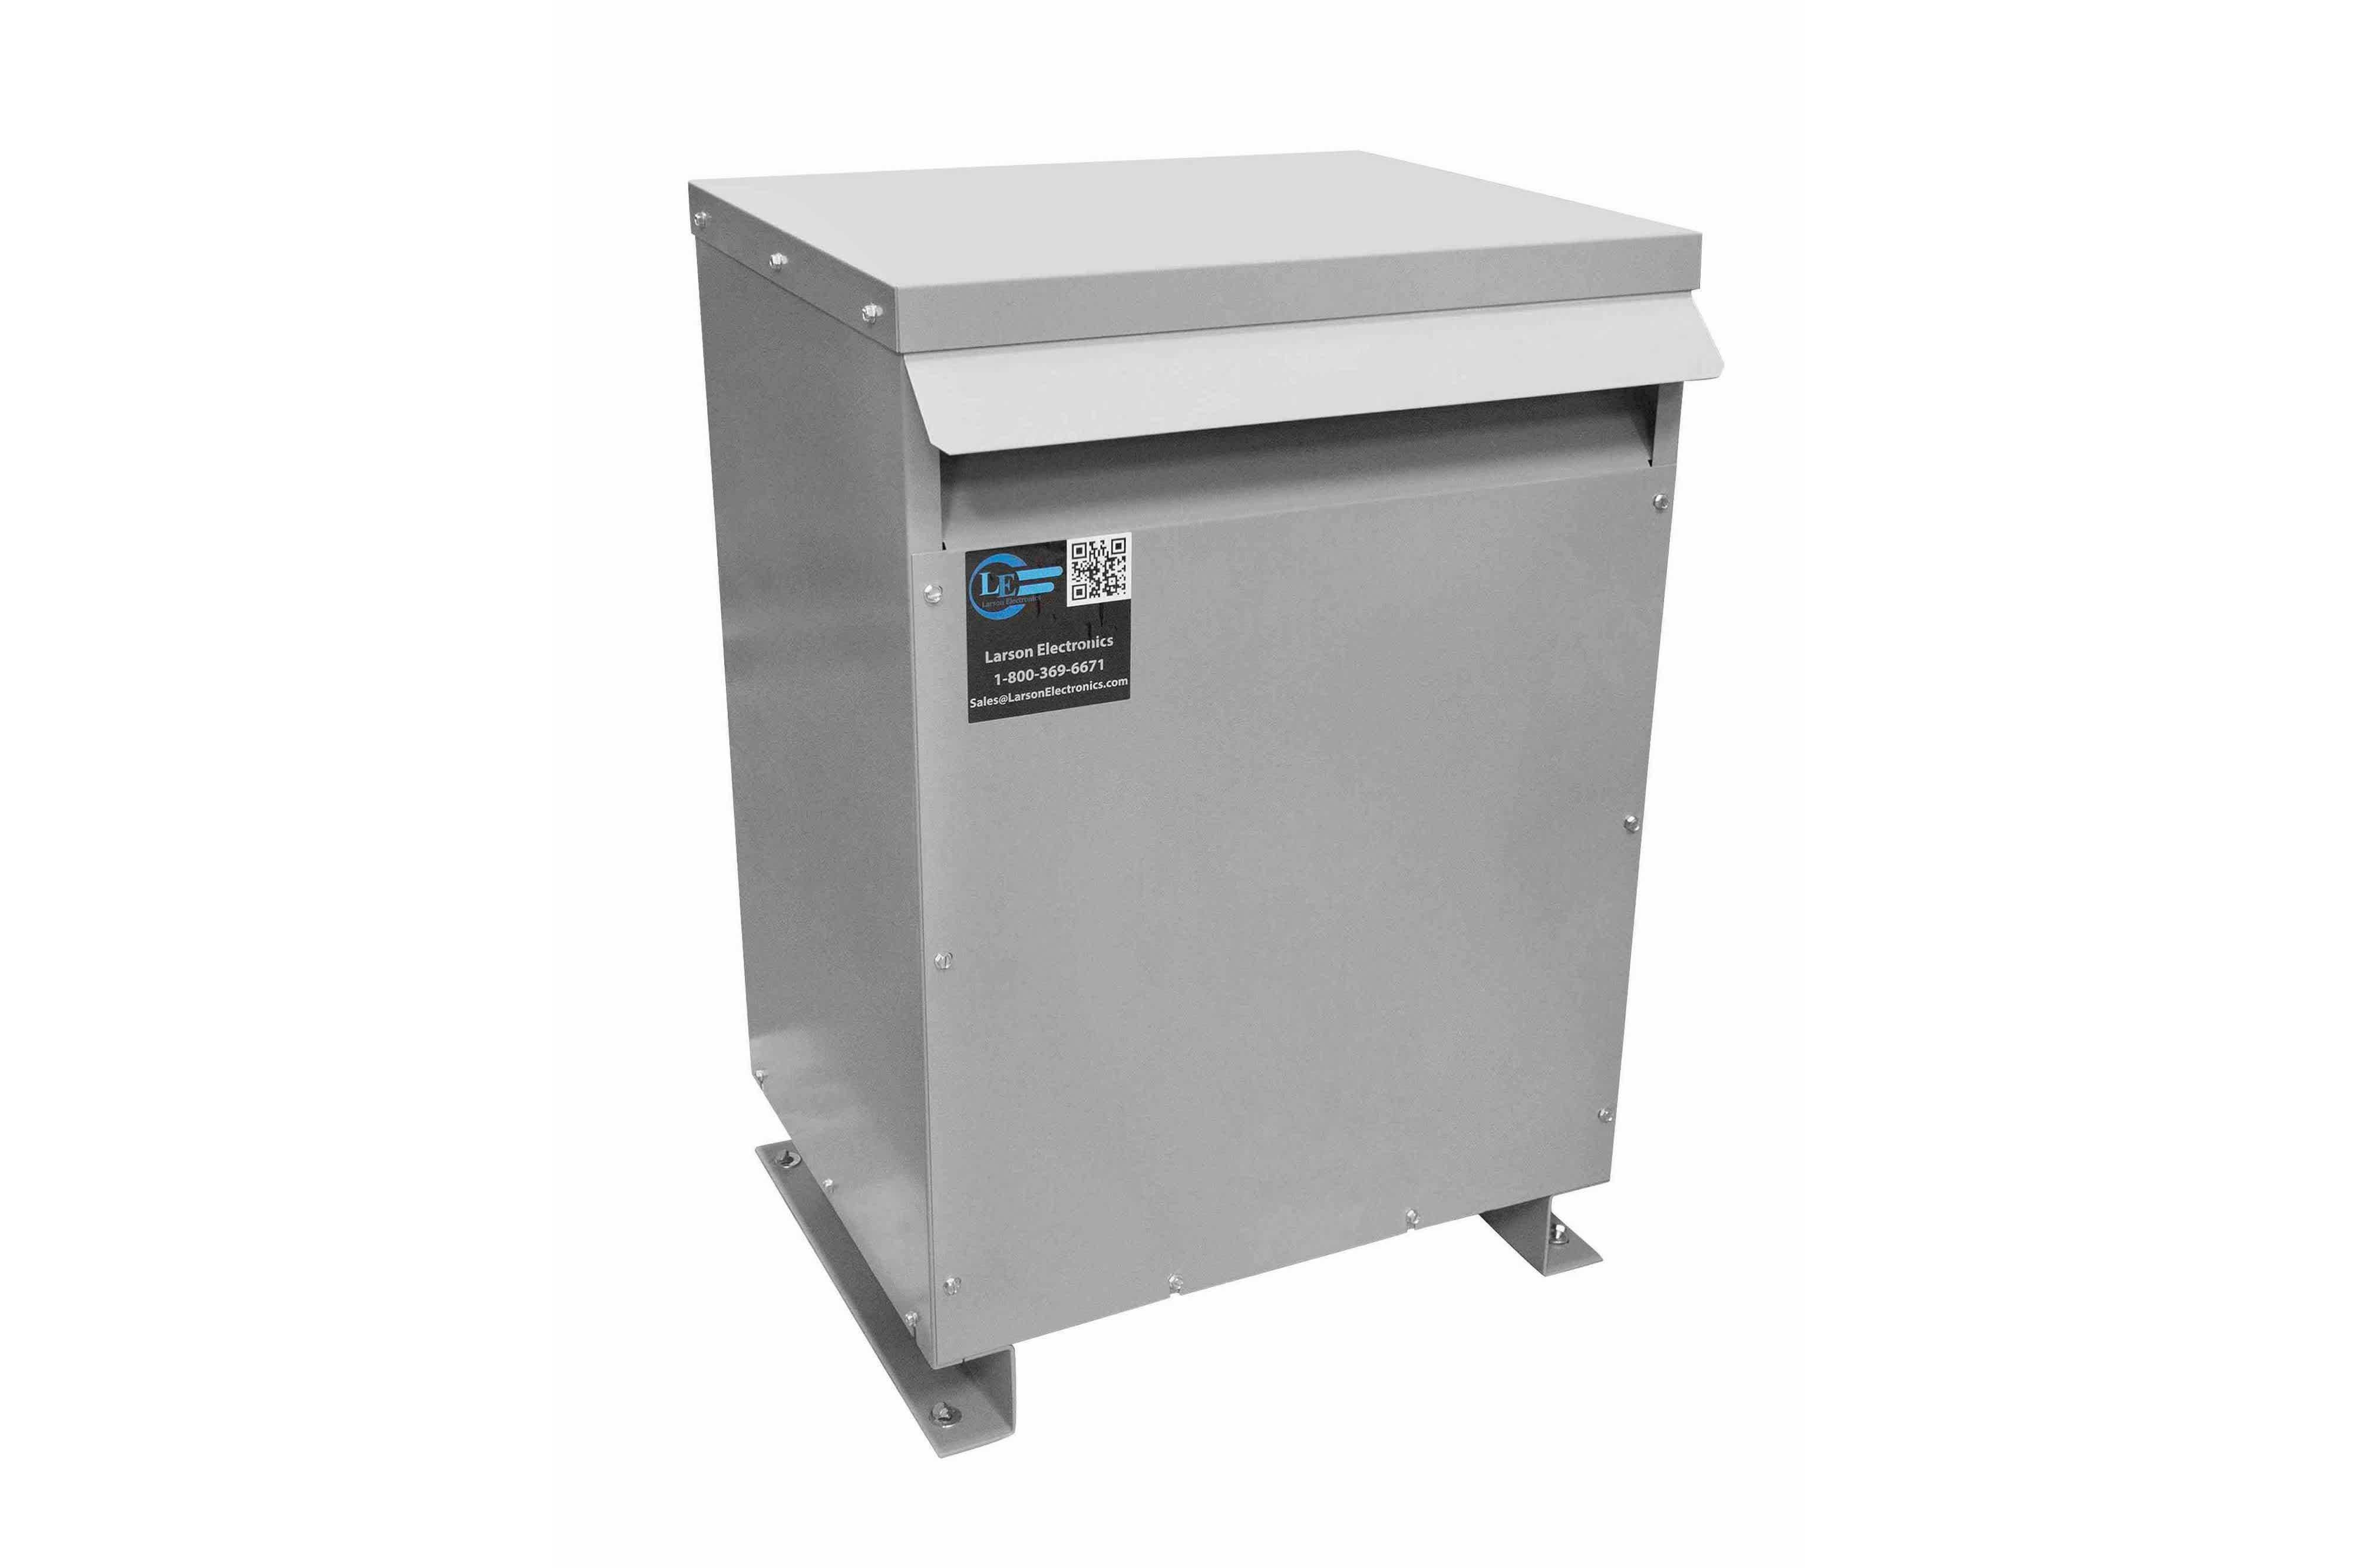 225 kVA 3PH Isolation Transformer, 575V Wye Primary, 380Y/220 Wye-N Secondary, N3R, Ventilated, 60 Hz